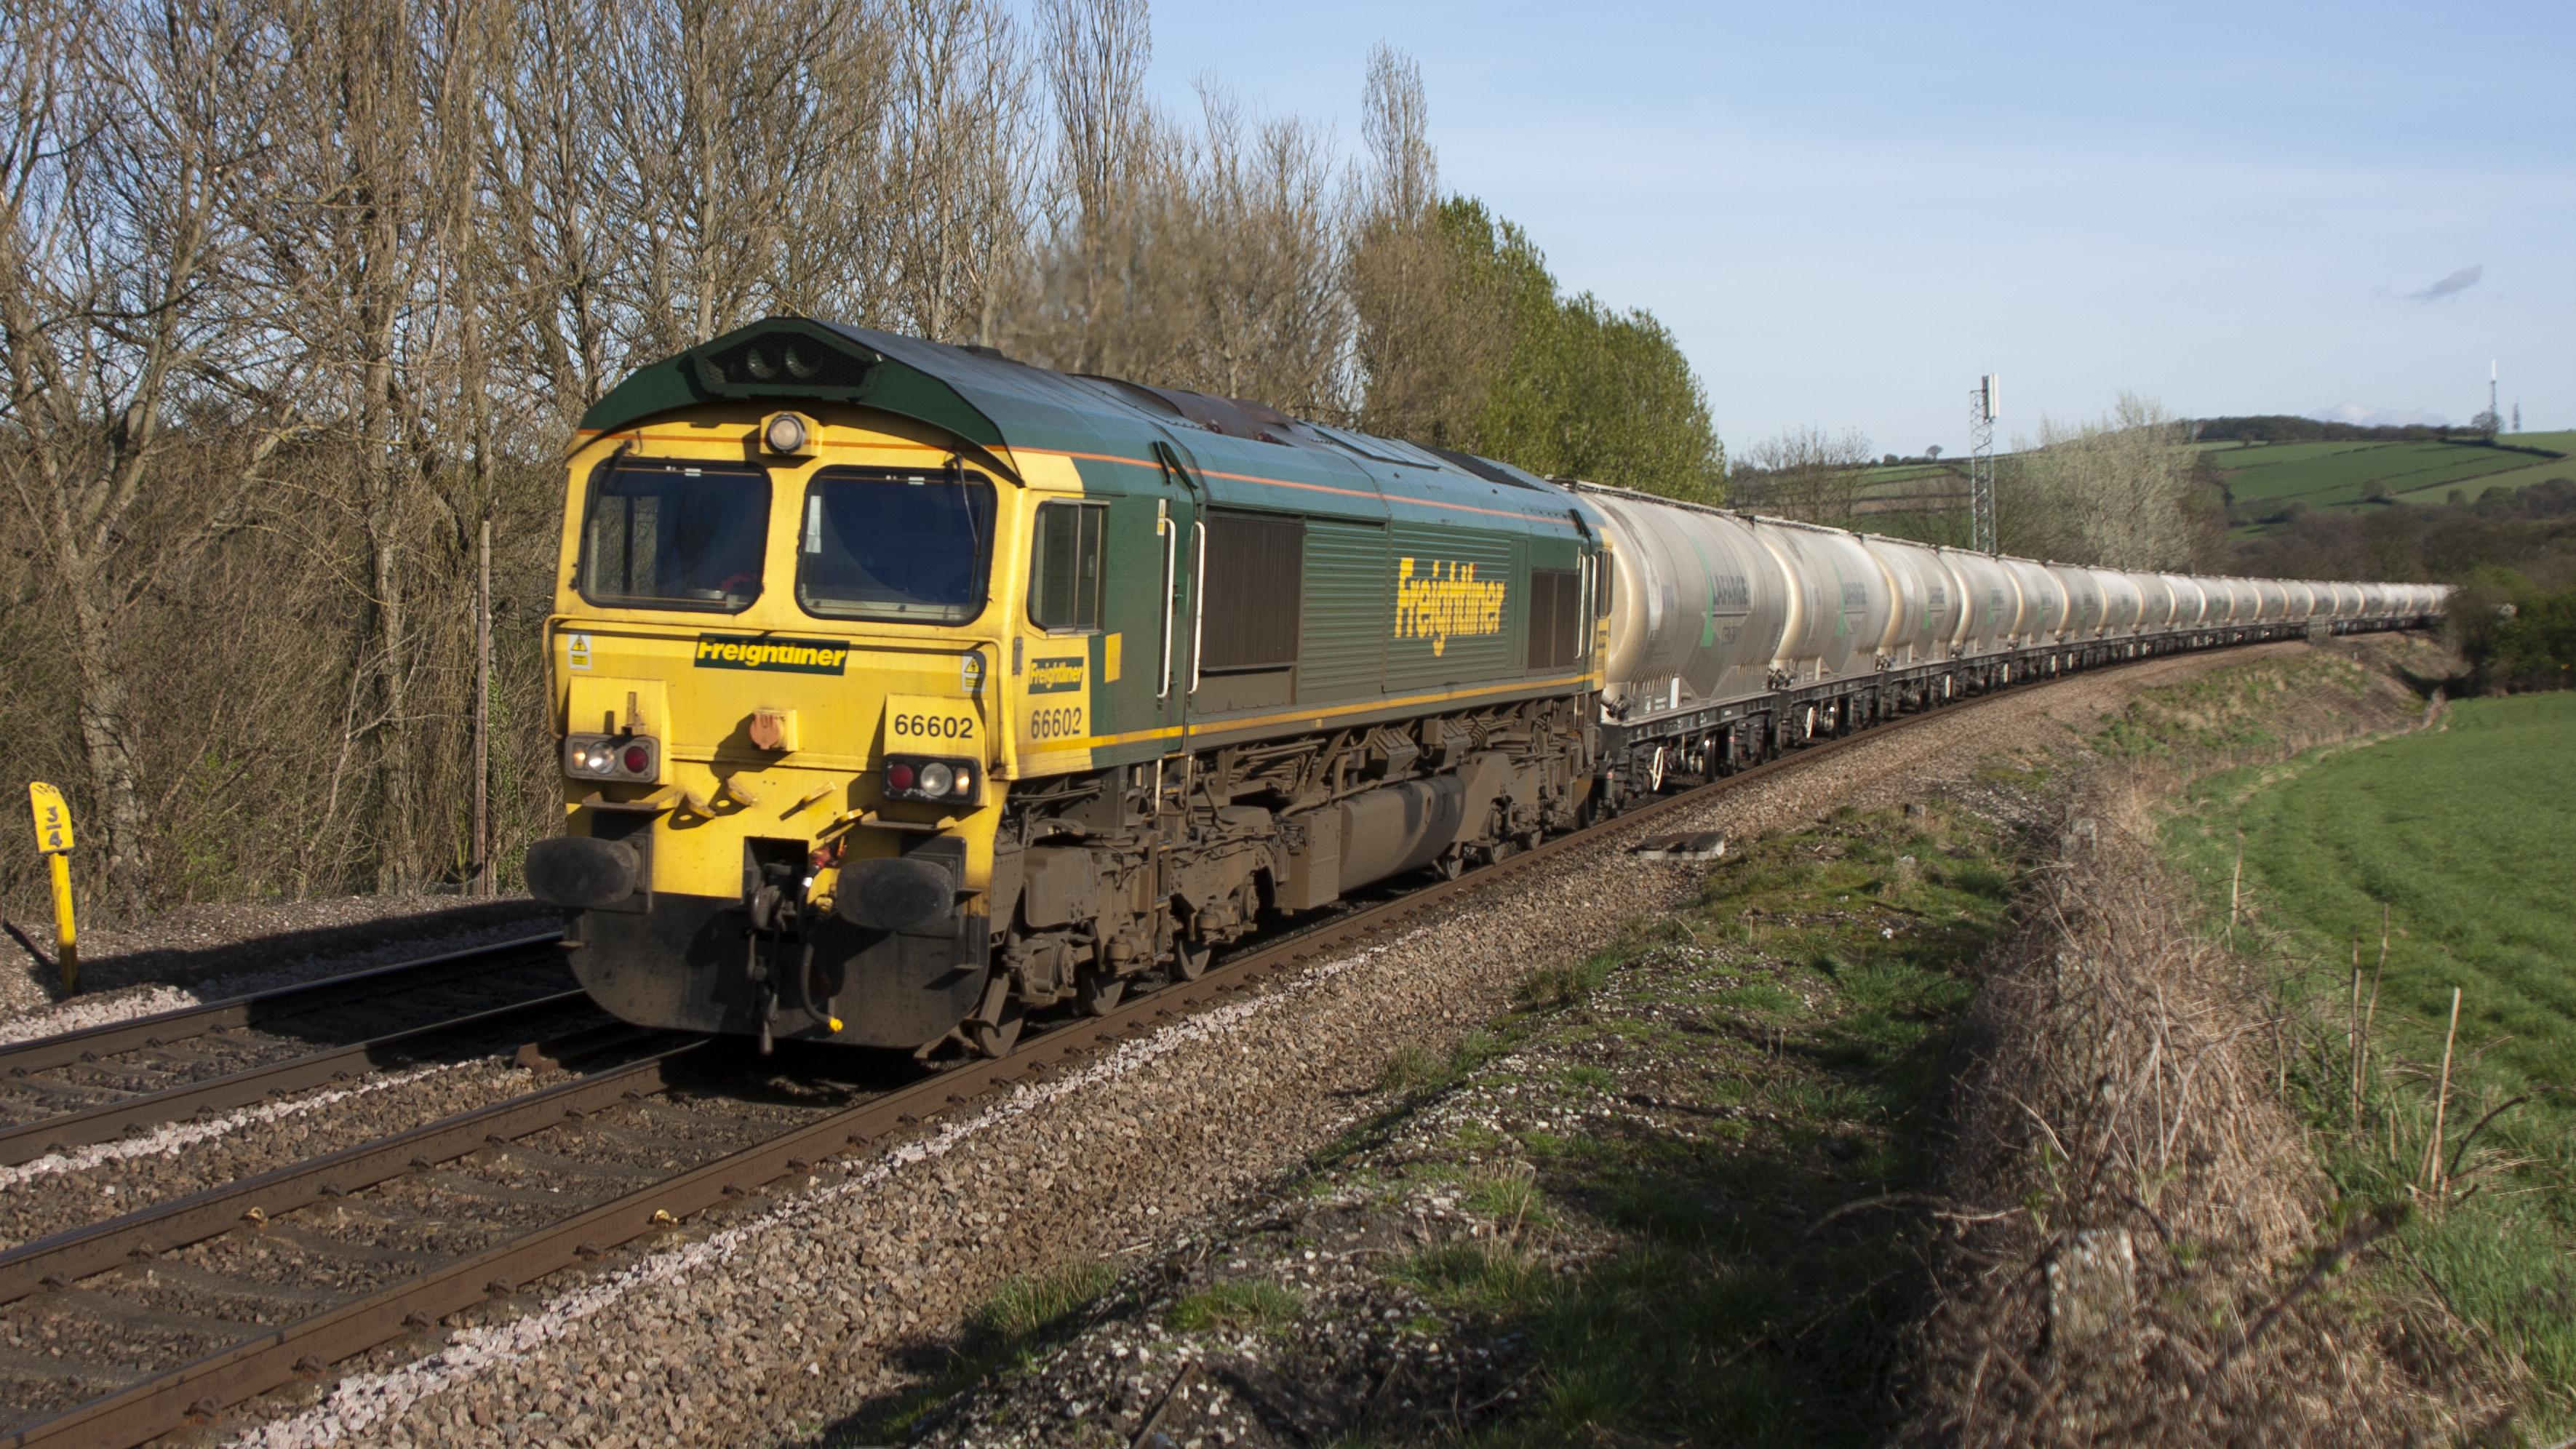 File:UK railway train, carrying cement -a.jpg - Wikimedia ... Railway